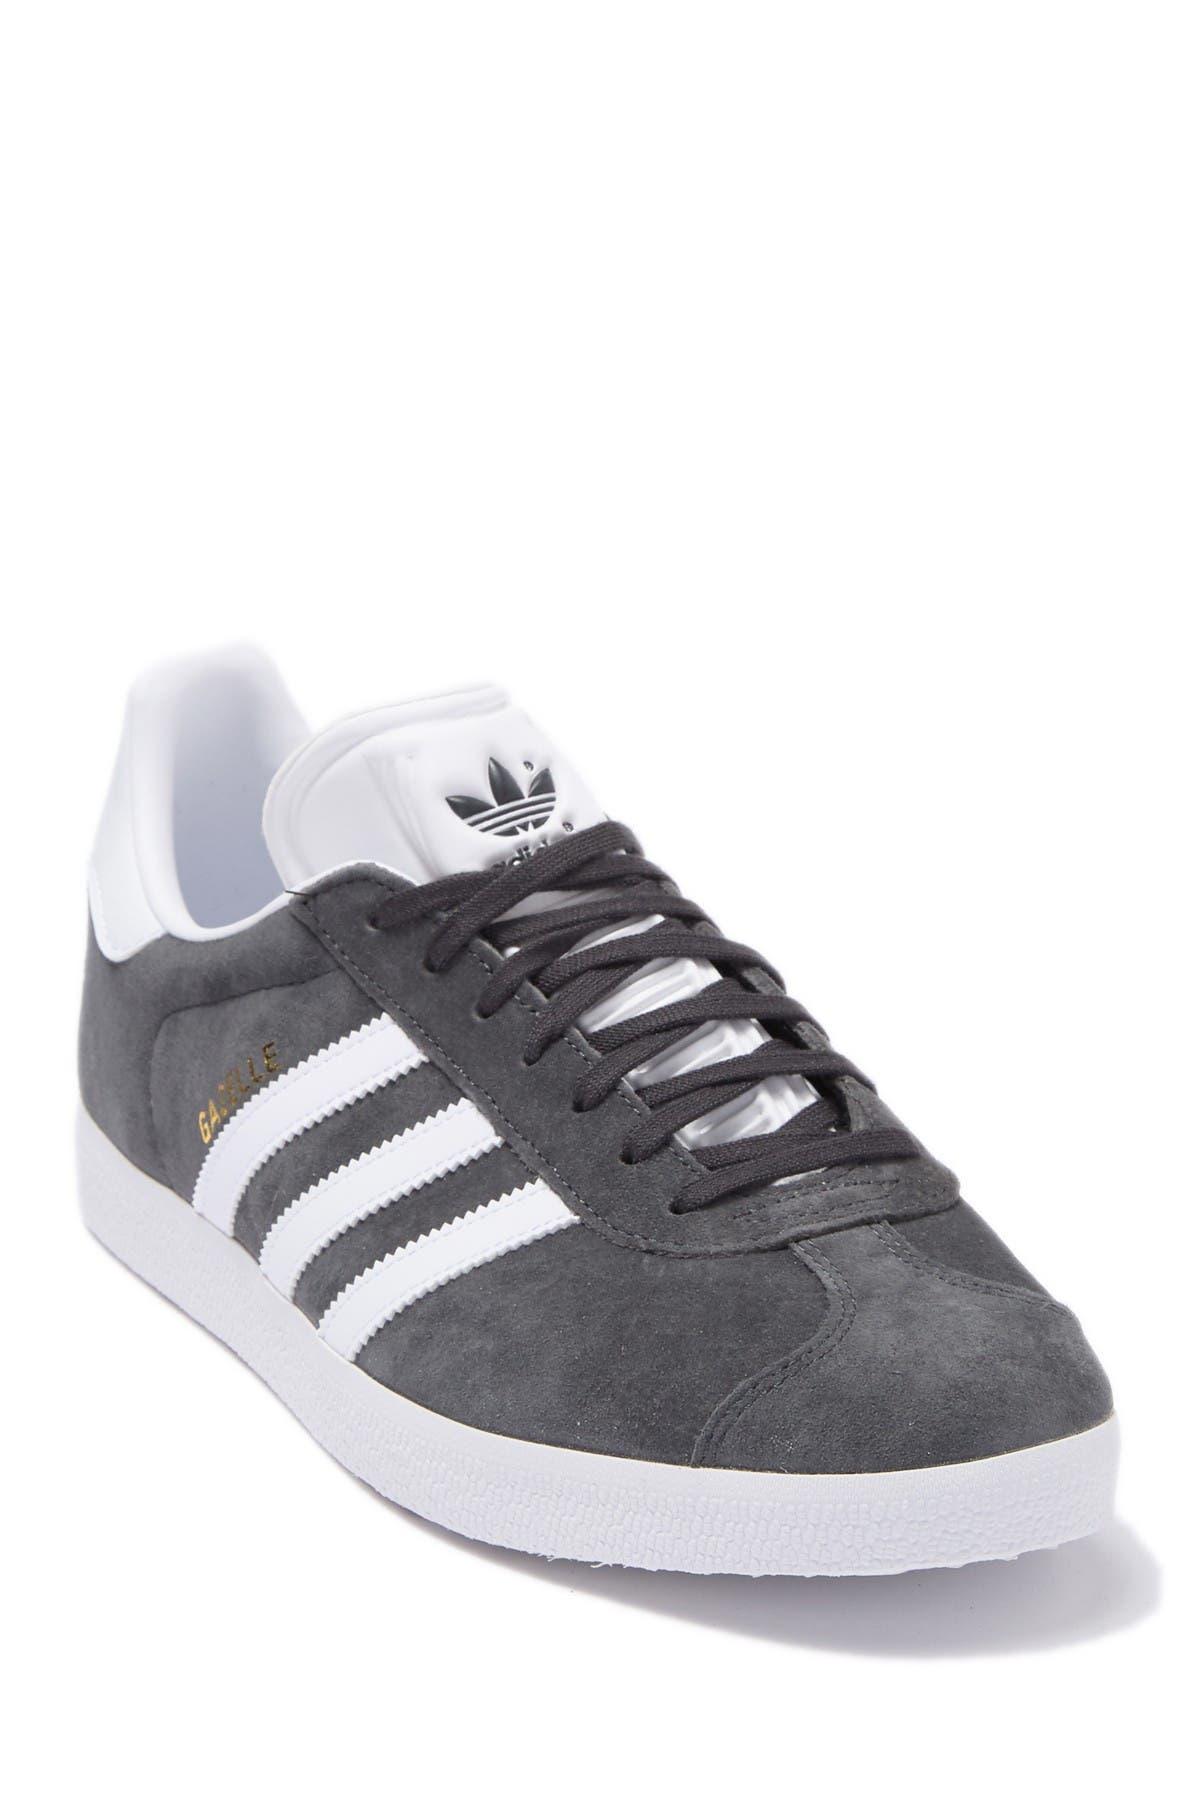 adidas   Gazelle Sneaker   Nordstrom Rack